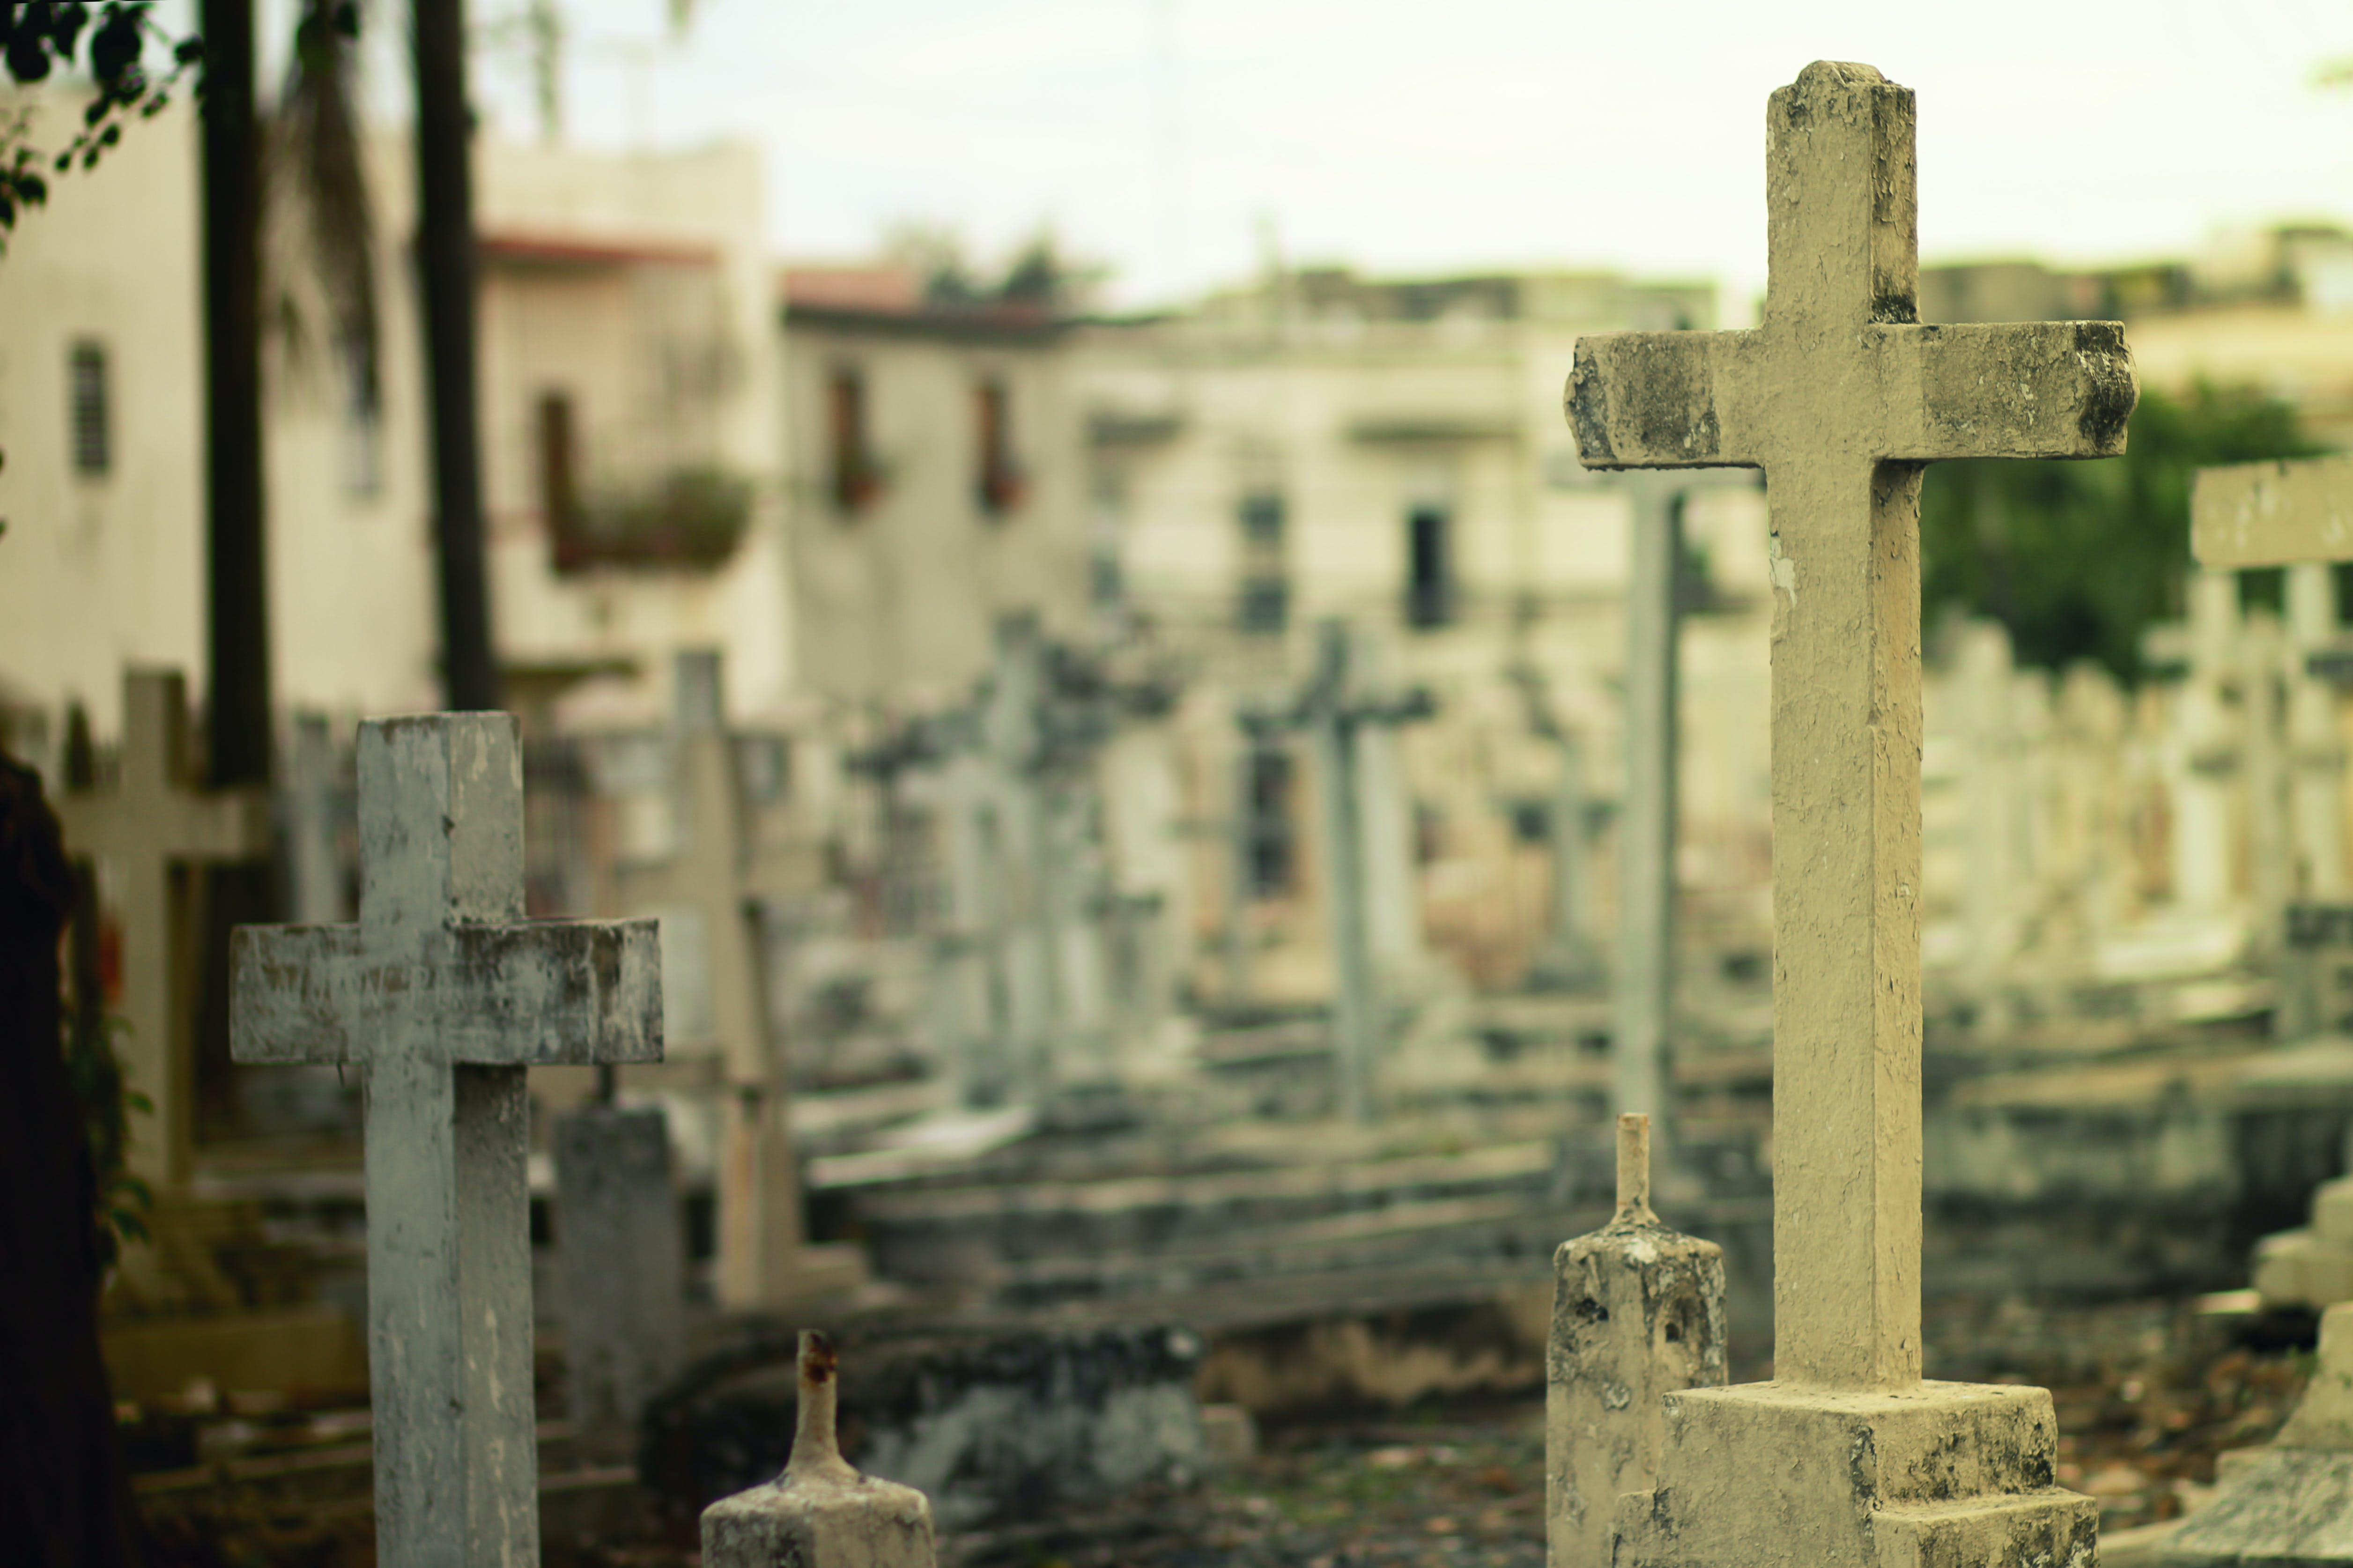 2 White Headstone Inside Cemetery during Daytime